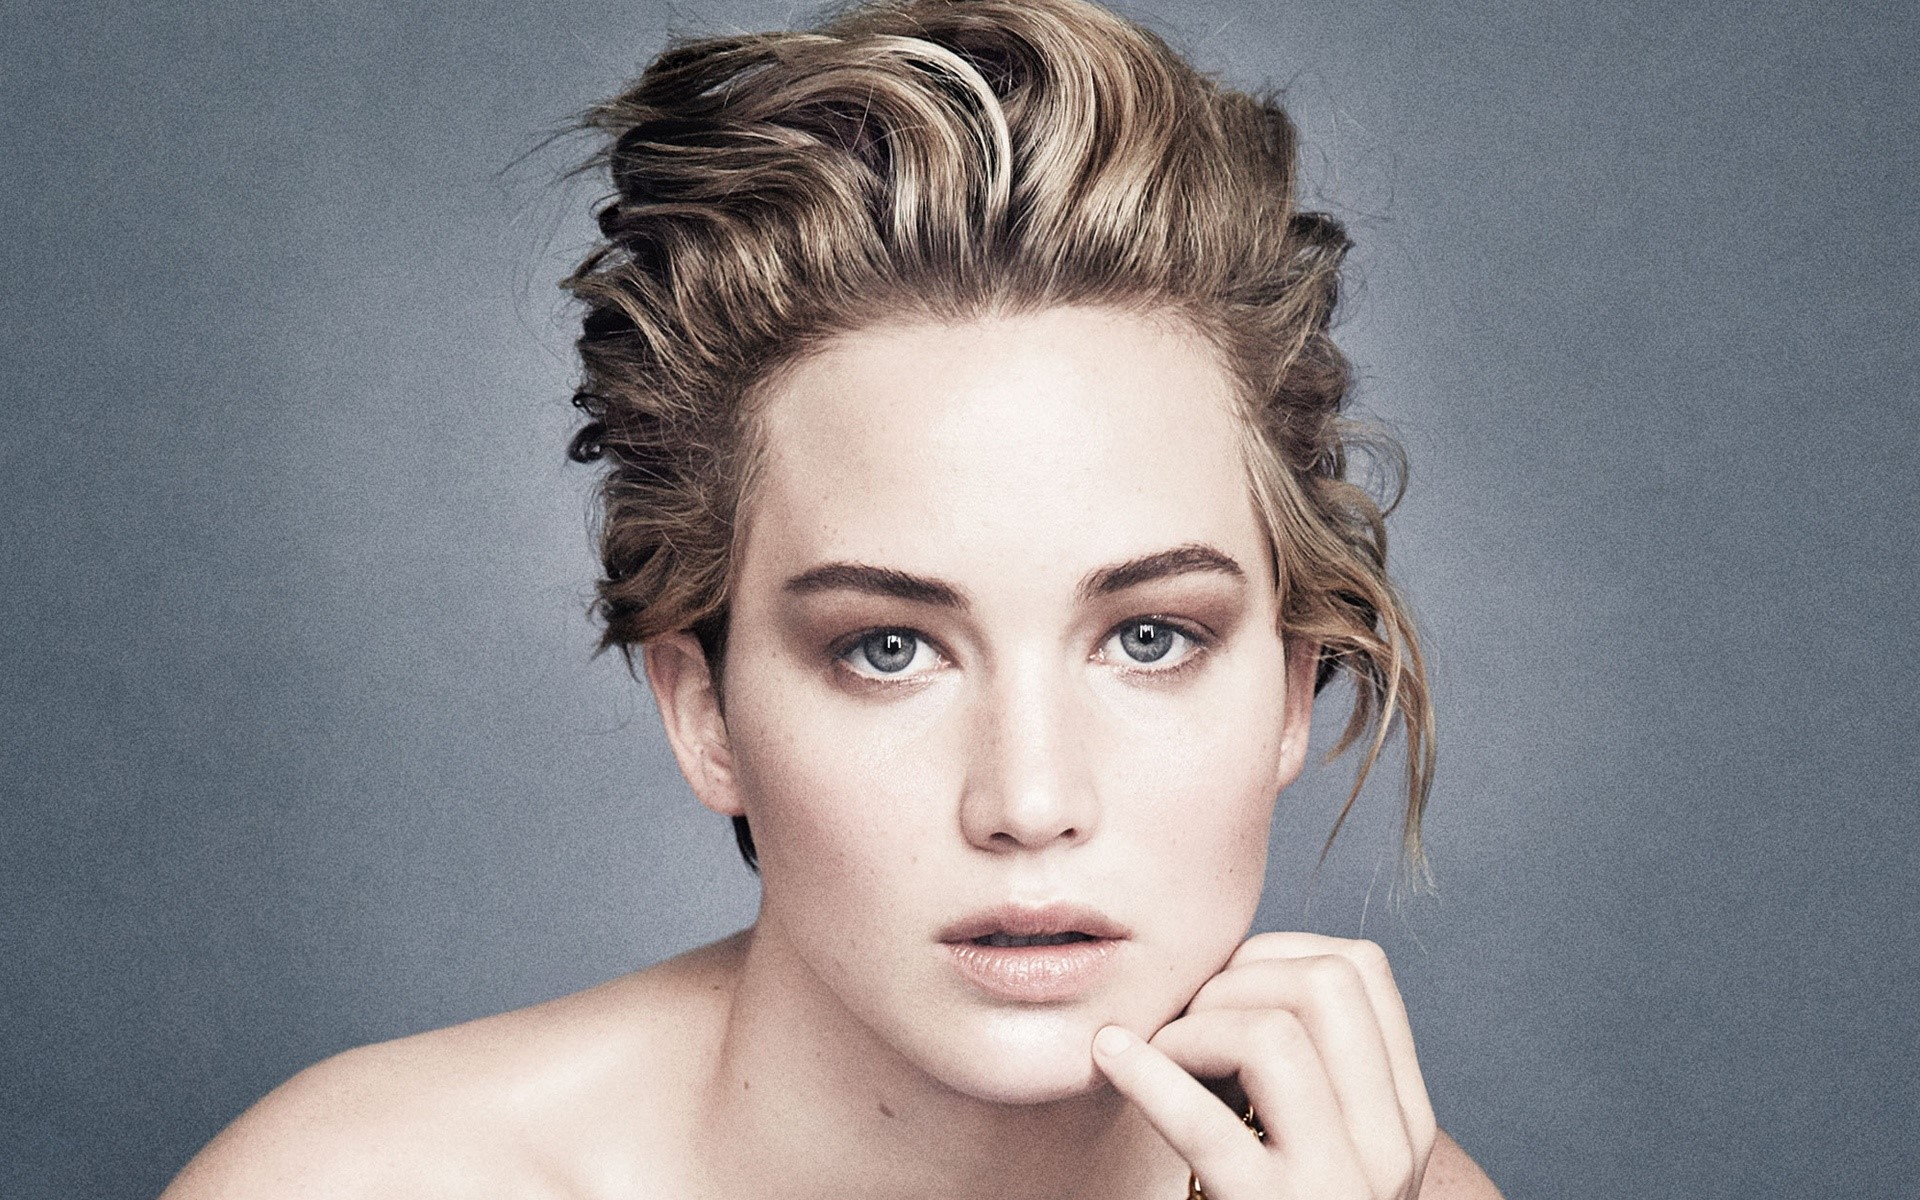 Fondo de pantalla de Jennifer Lawrence con cabello corto Imágenes